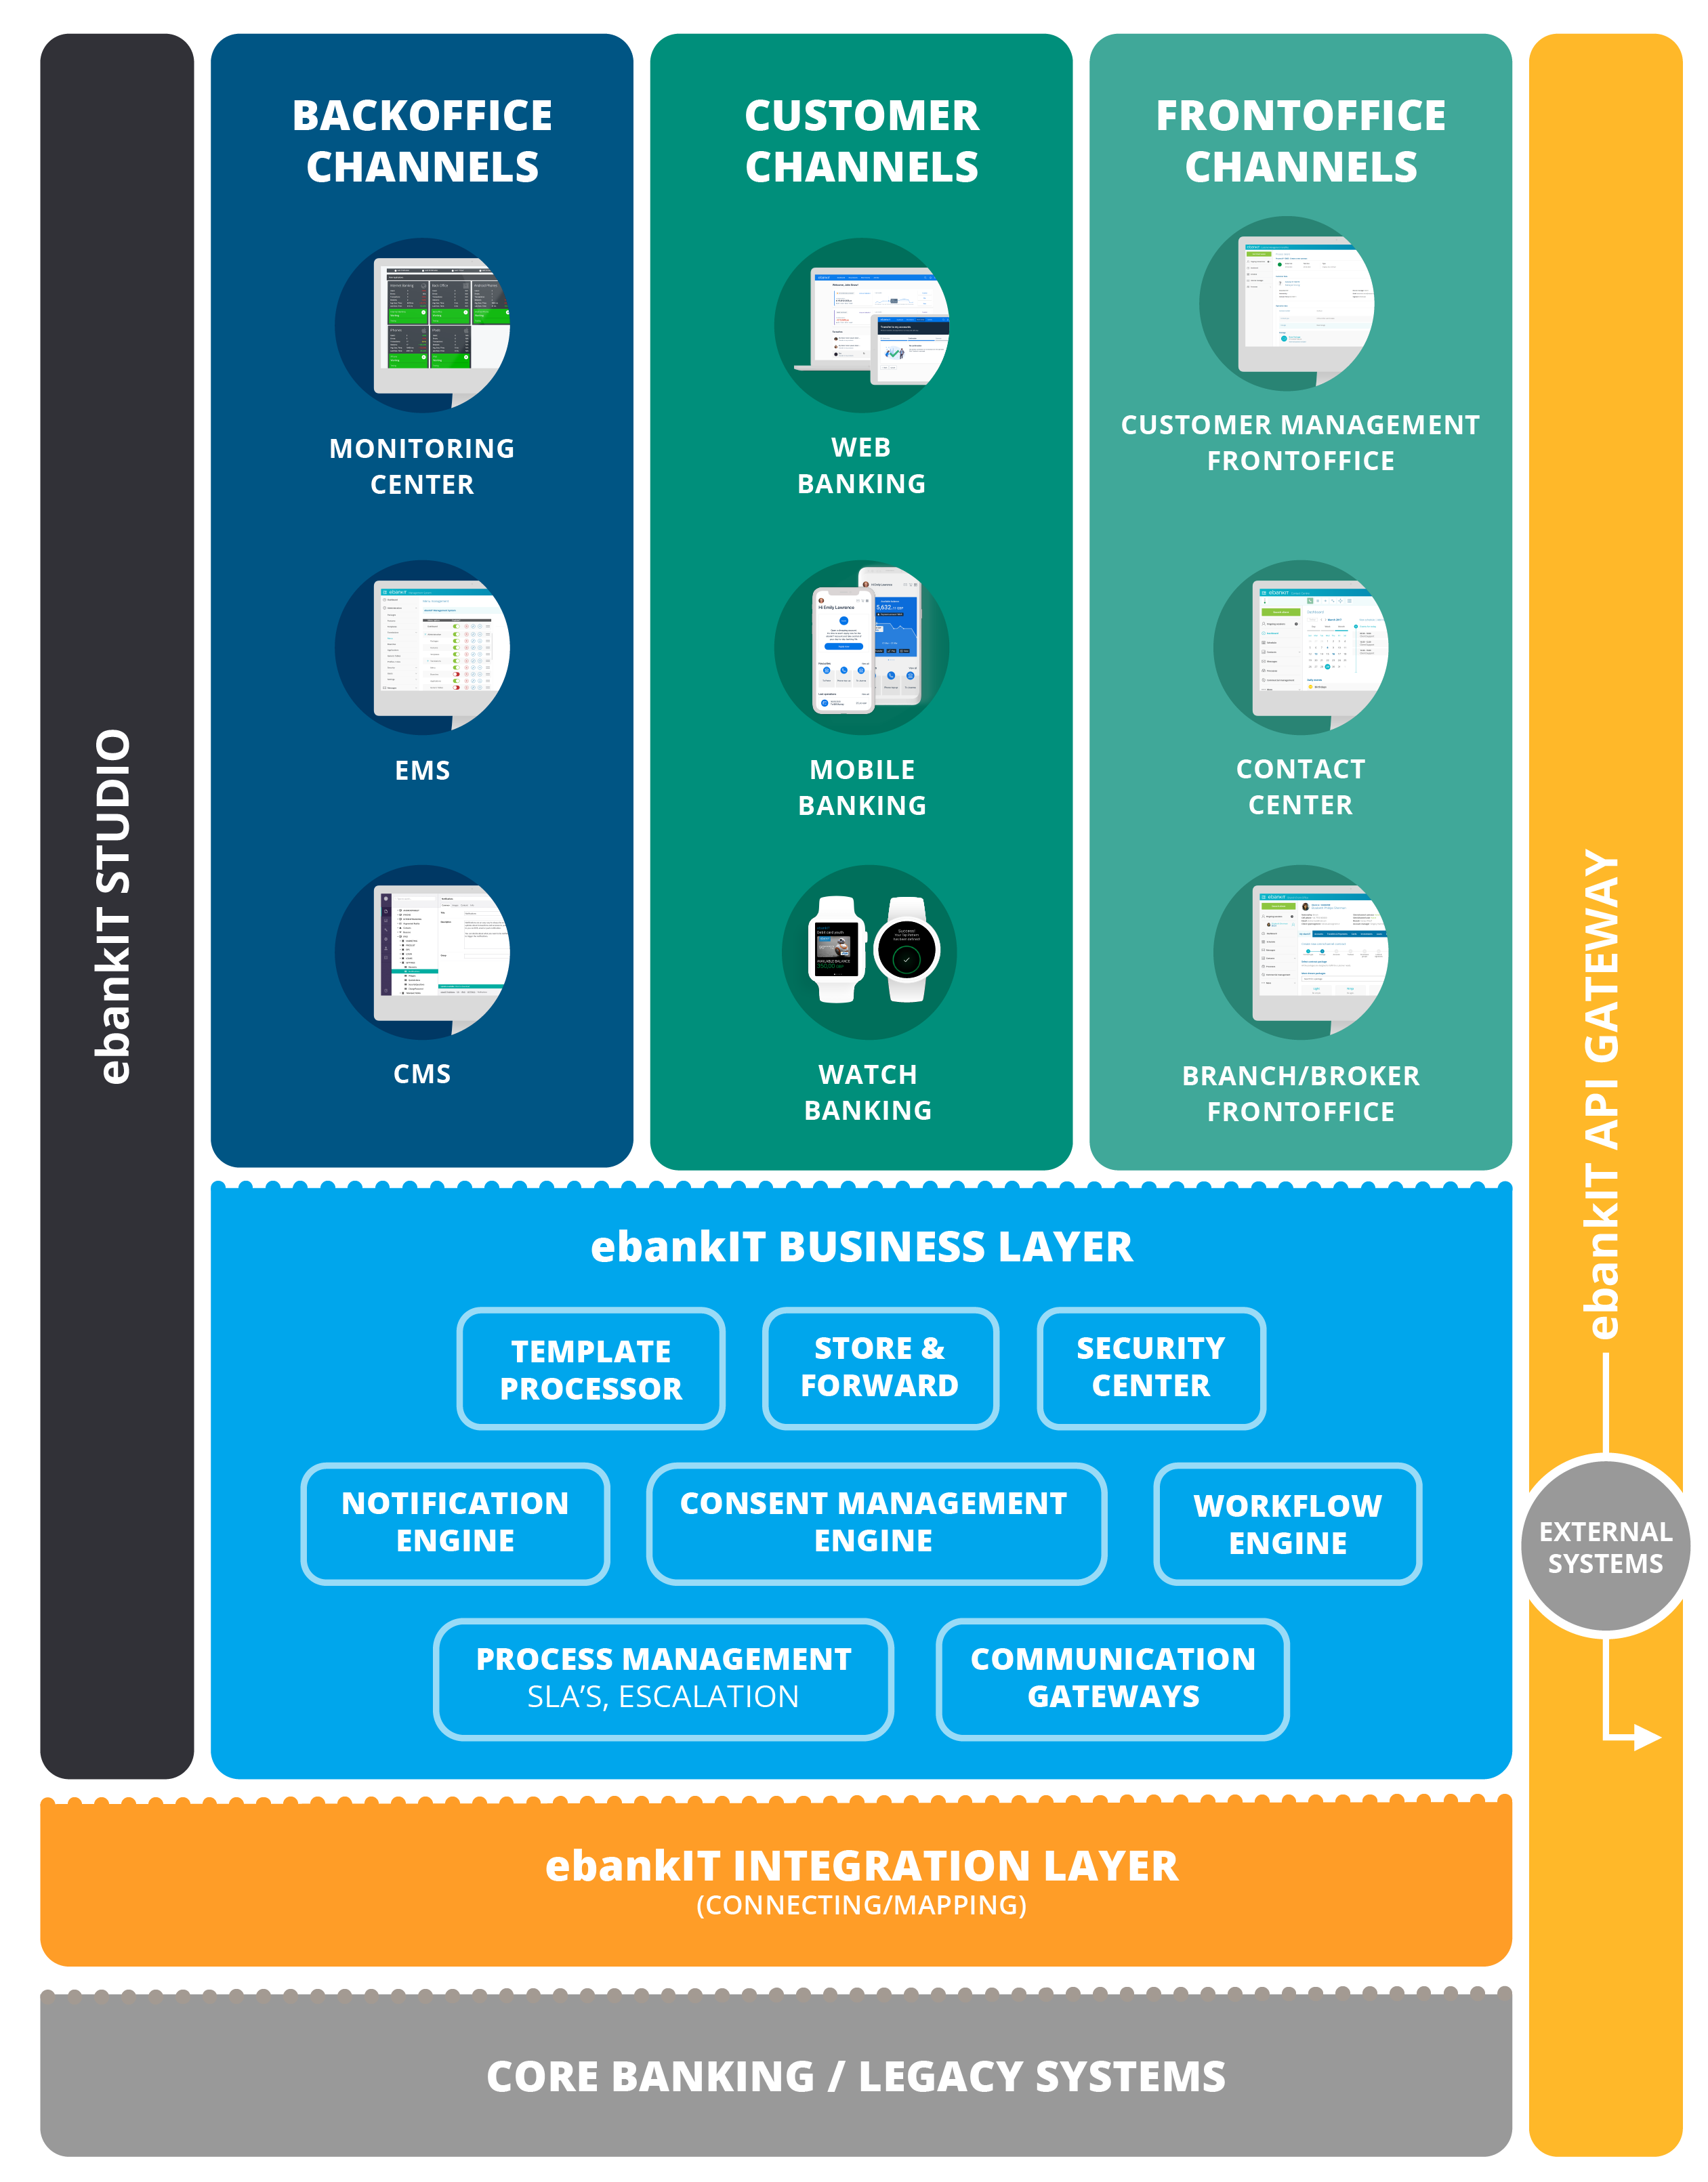 ebankit_platform_2020_mobile